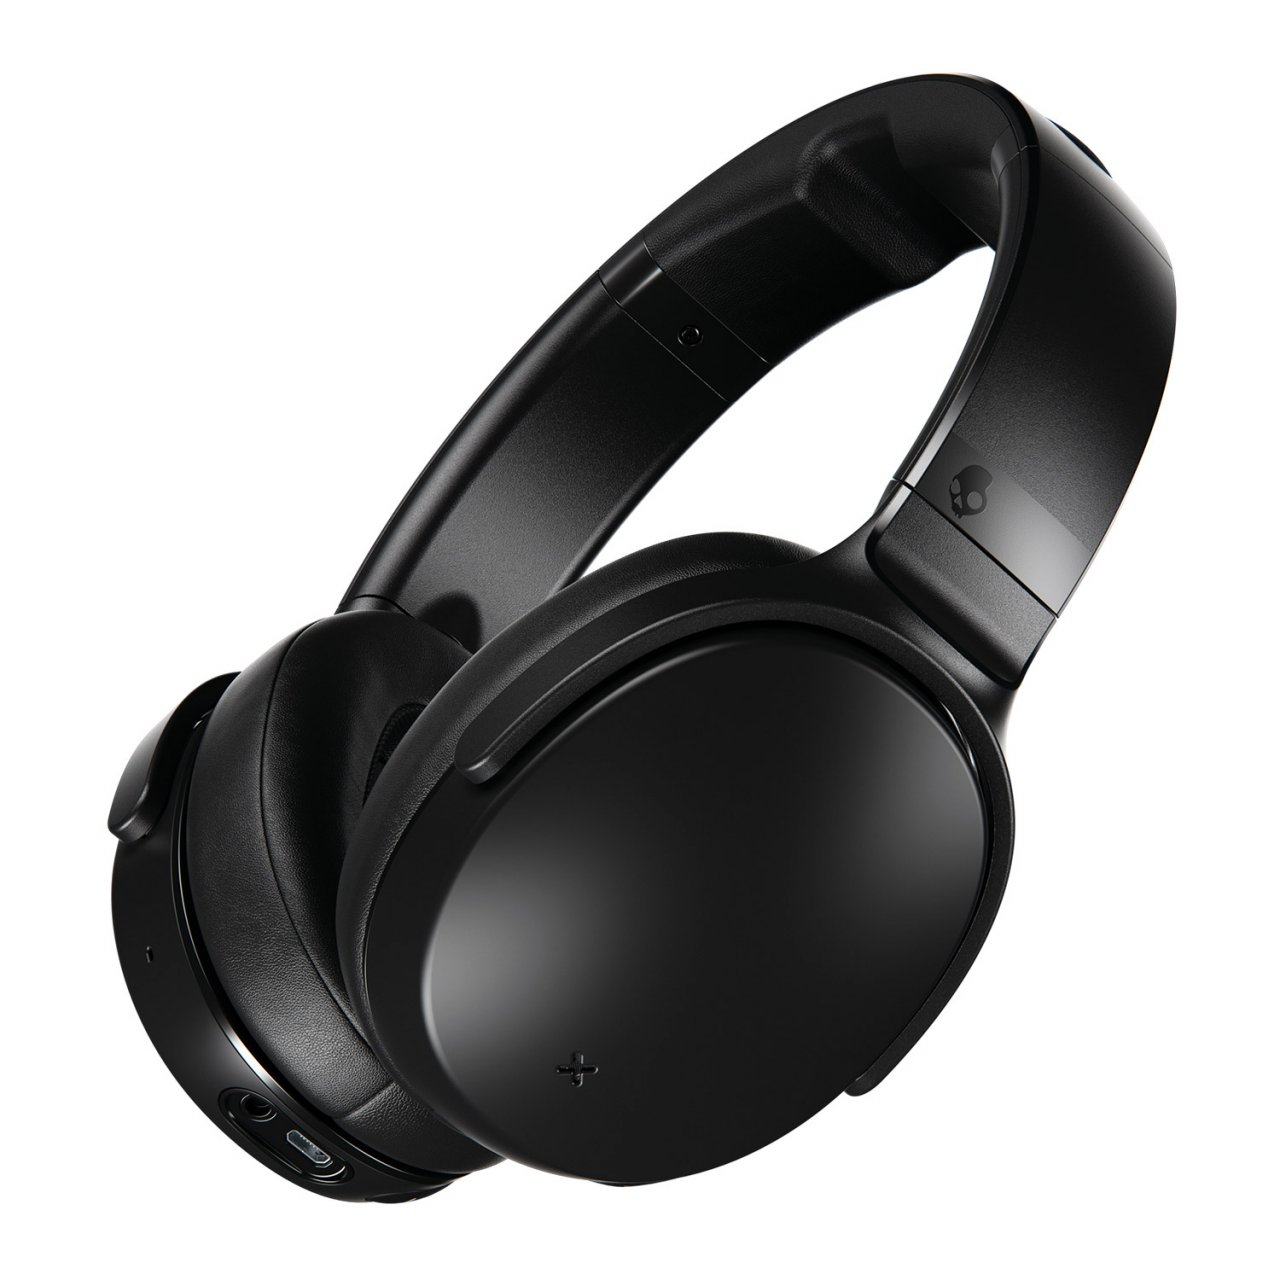 1b8e6bec29b Shop Venue Noise Canceling Wireless Headphones | Skullcandy